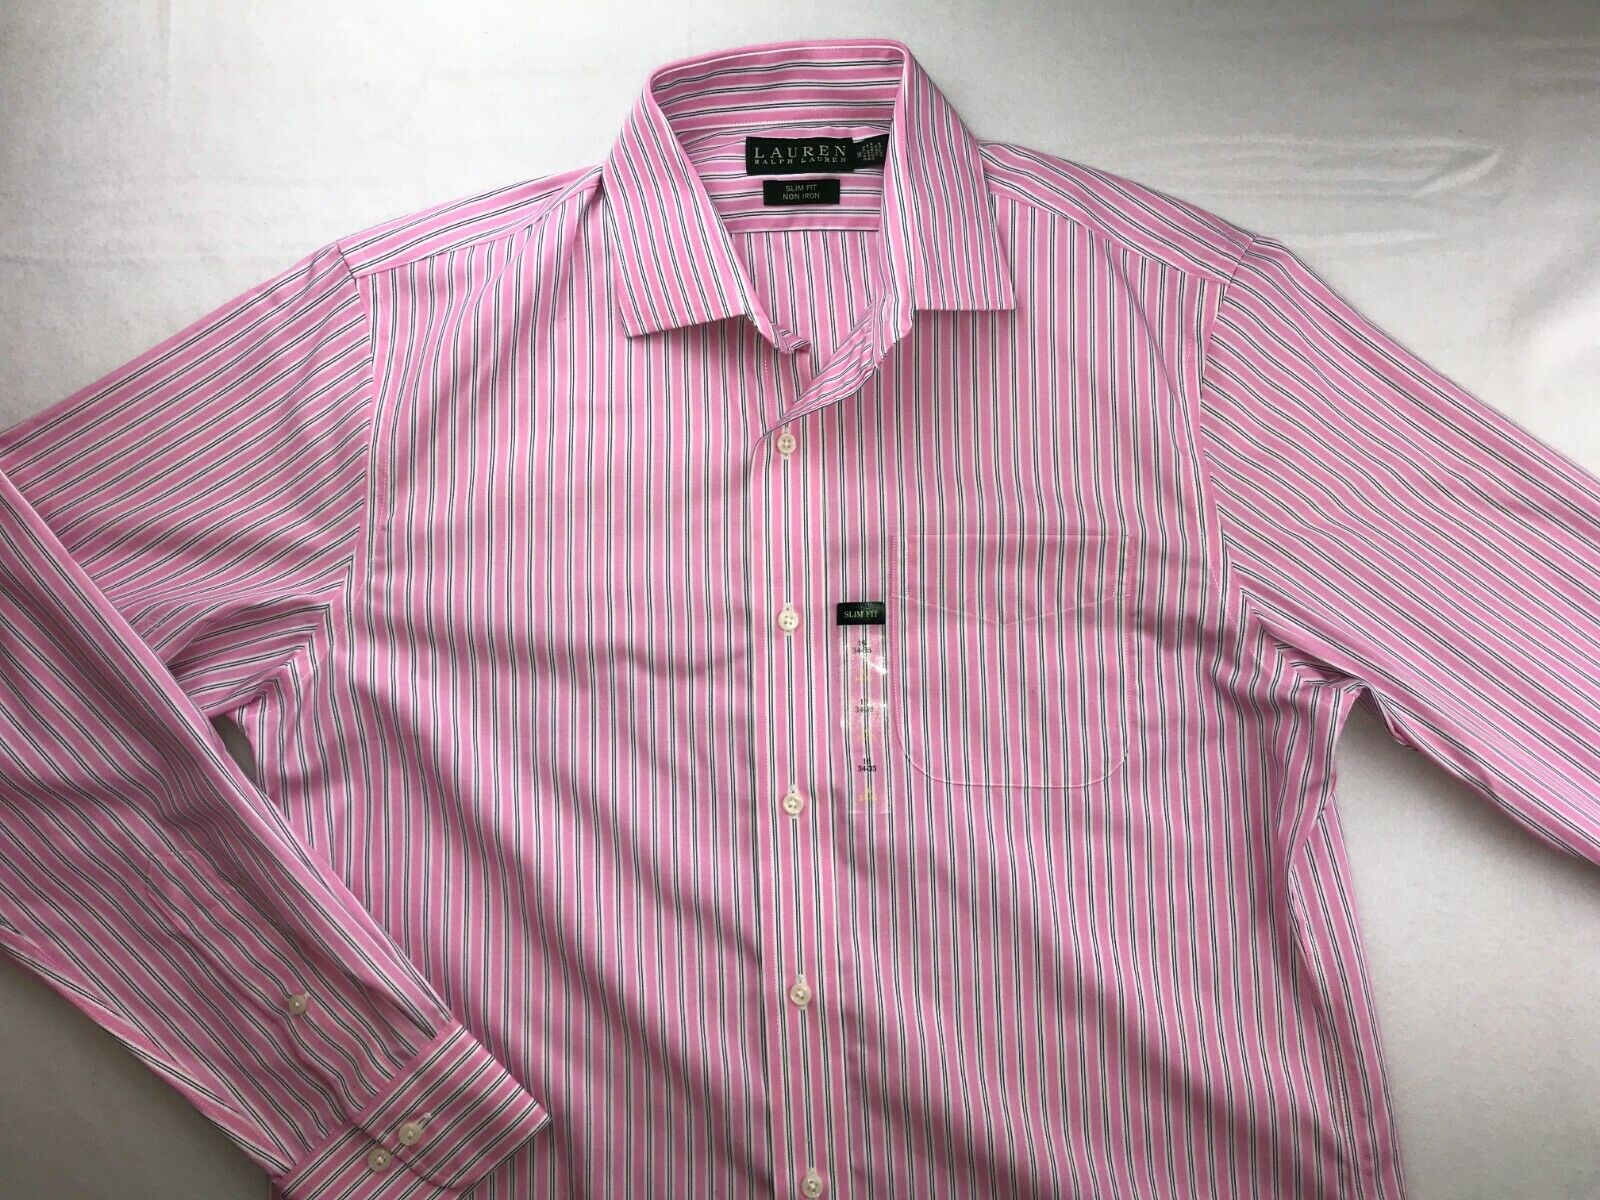 fa4b121b1e48a5 NWT RALPH POLO SLIM FIT BUTTON DOWN LONG SLEEVE SHIRT 16 34 35 PINK - LAUREN  neequu12230-Formal Shirts